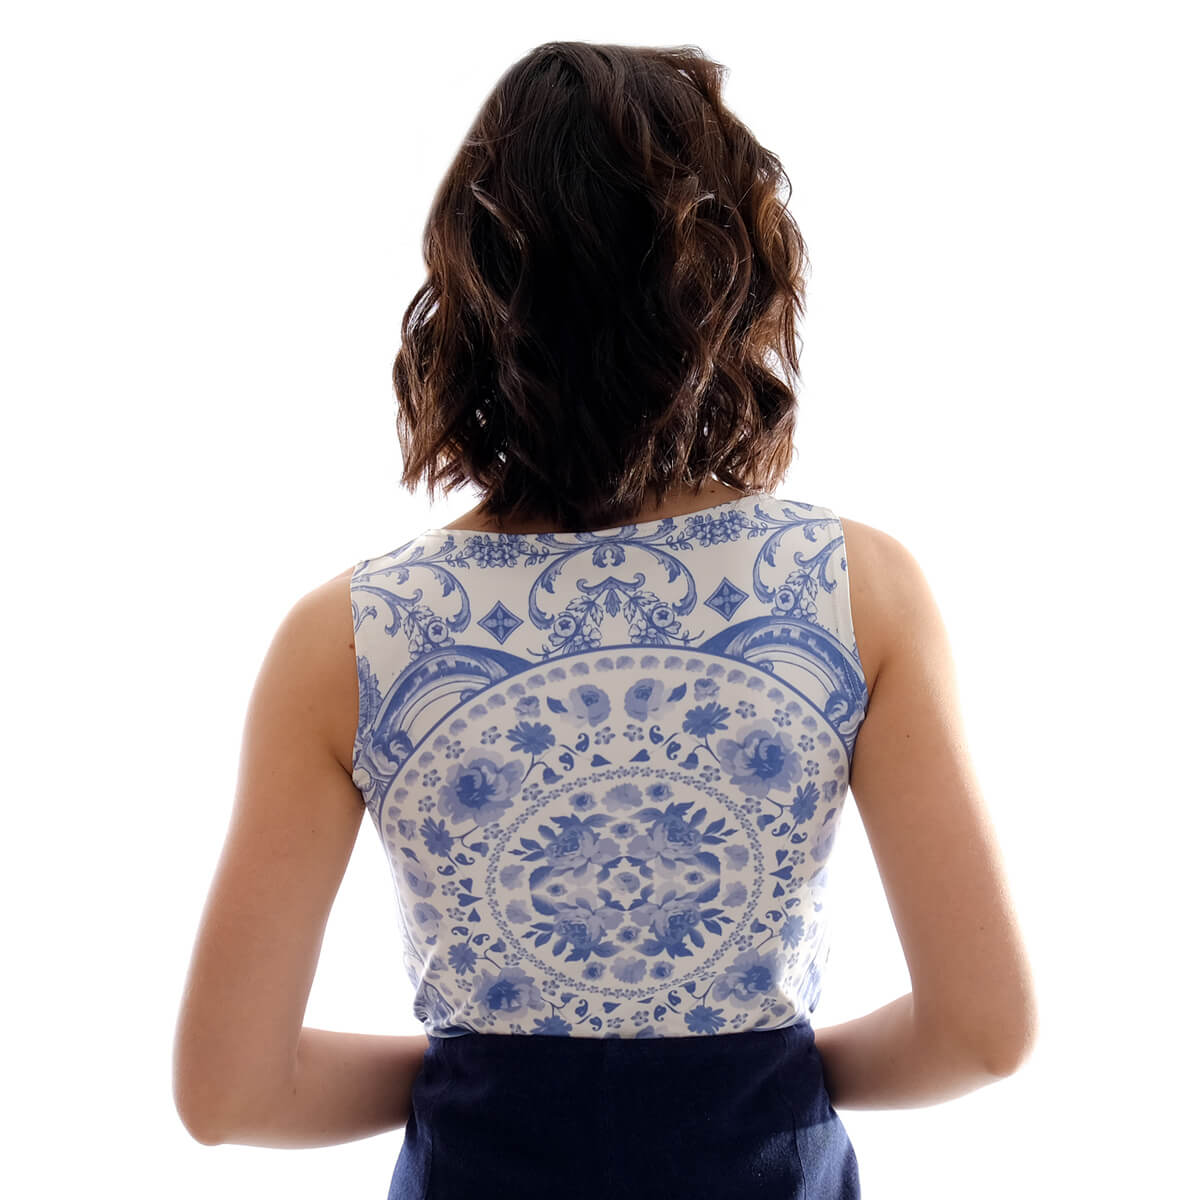 Regata Feminina Estampa Exclusiva Azulejo Português Azul Decote Canoa